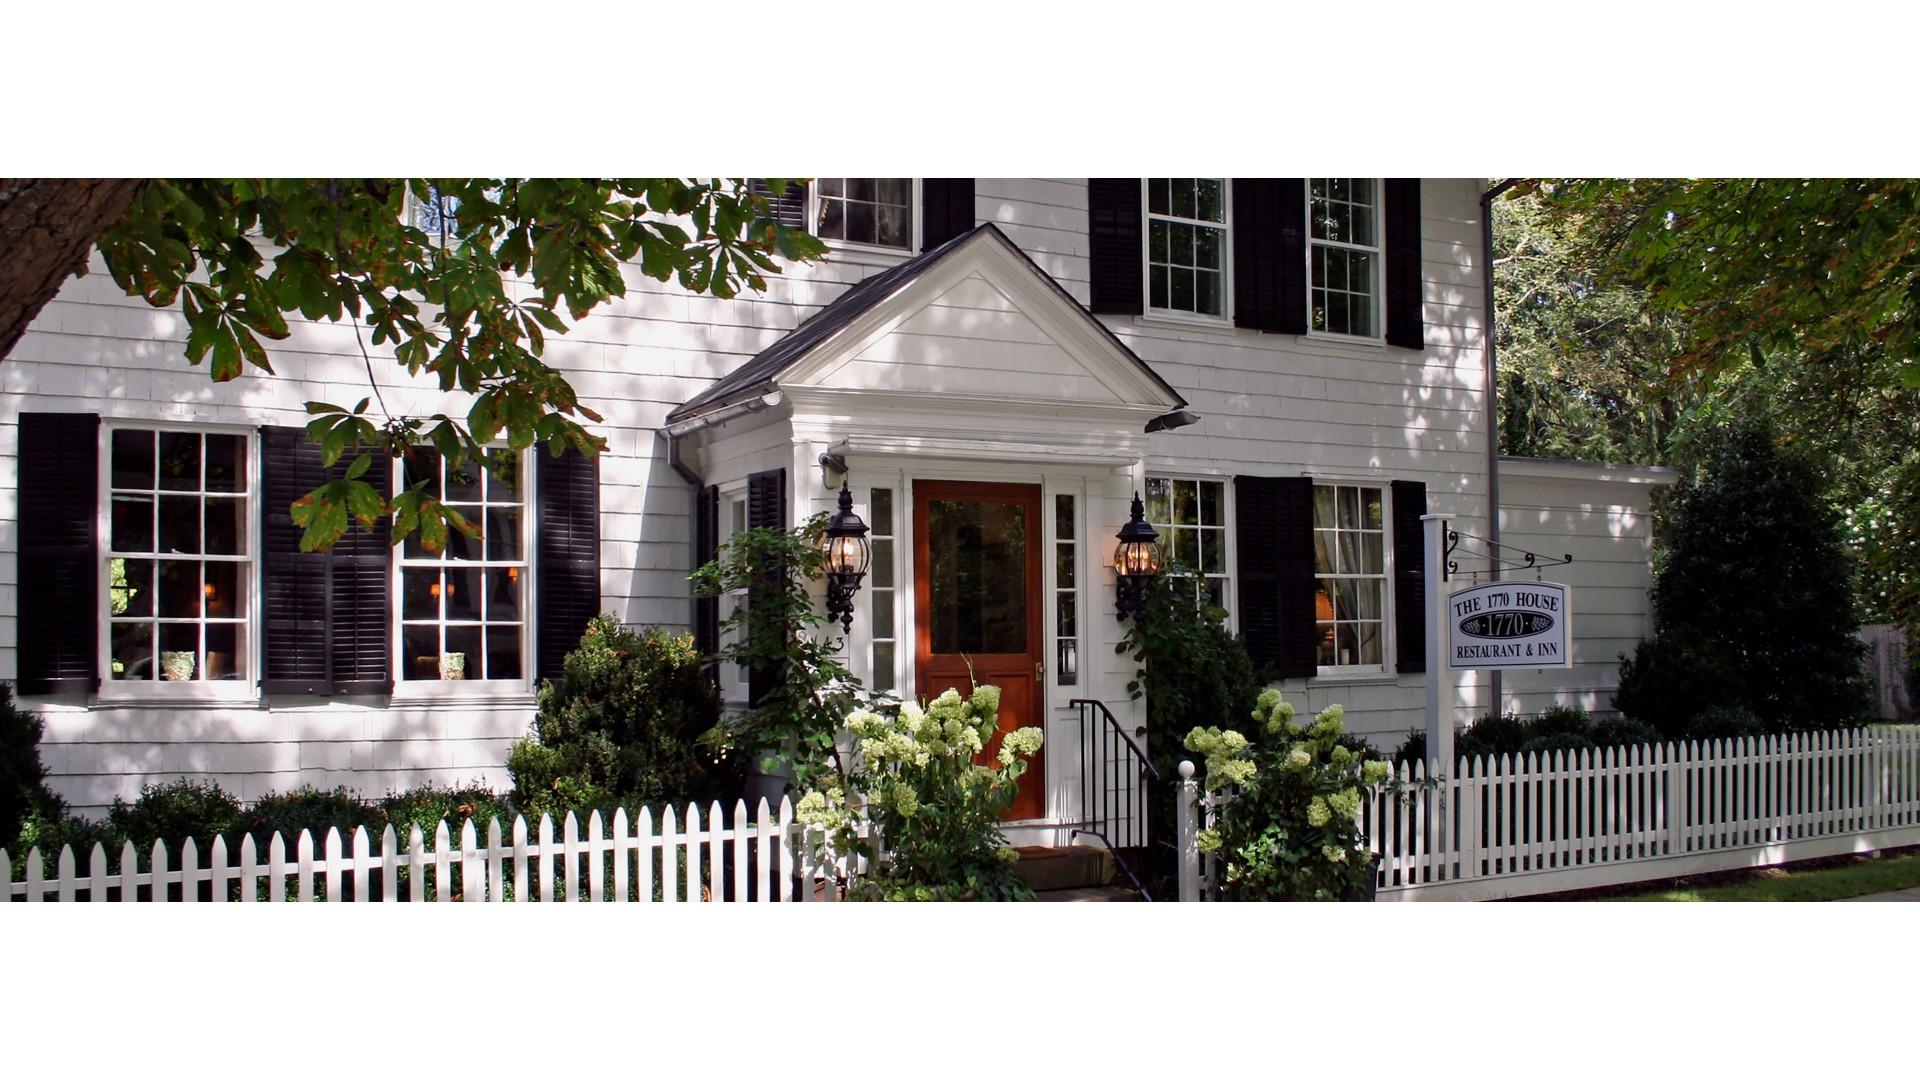 The 1770 House East Hampton Hamptons New York Smith Hotels